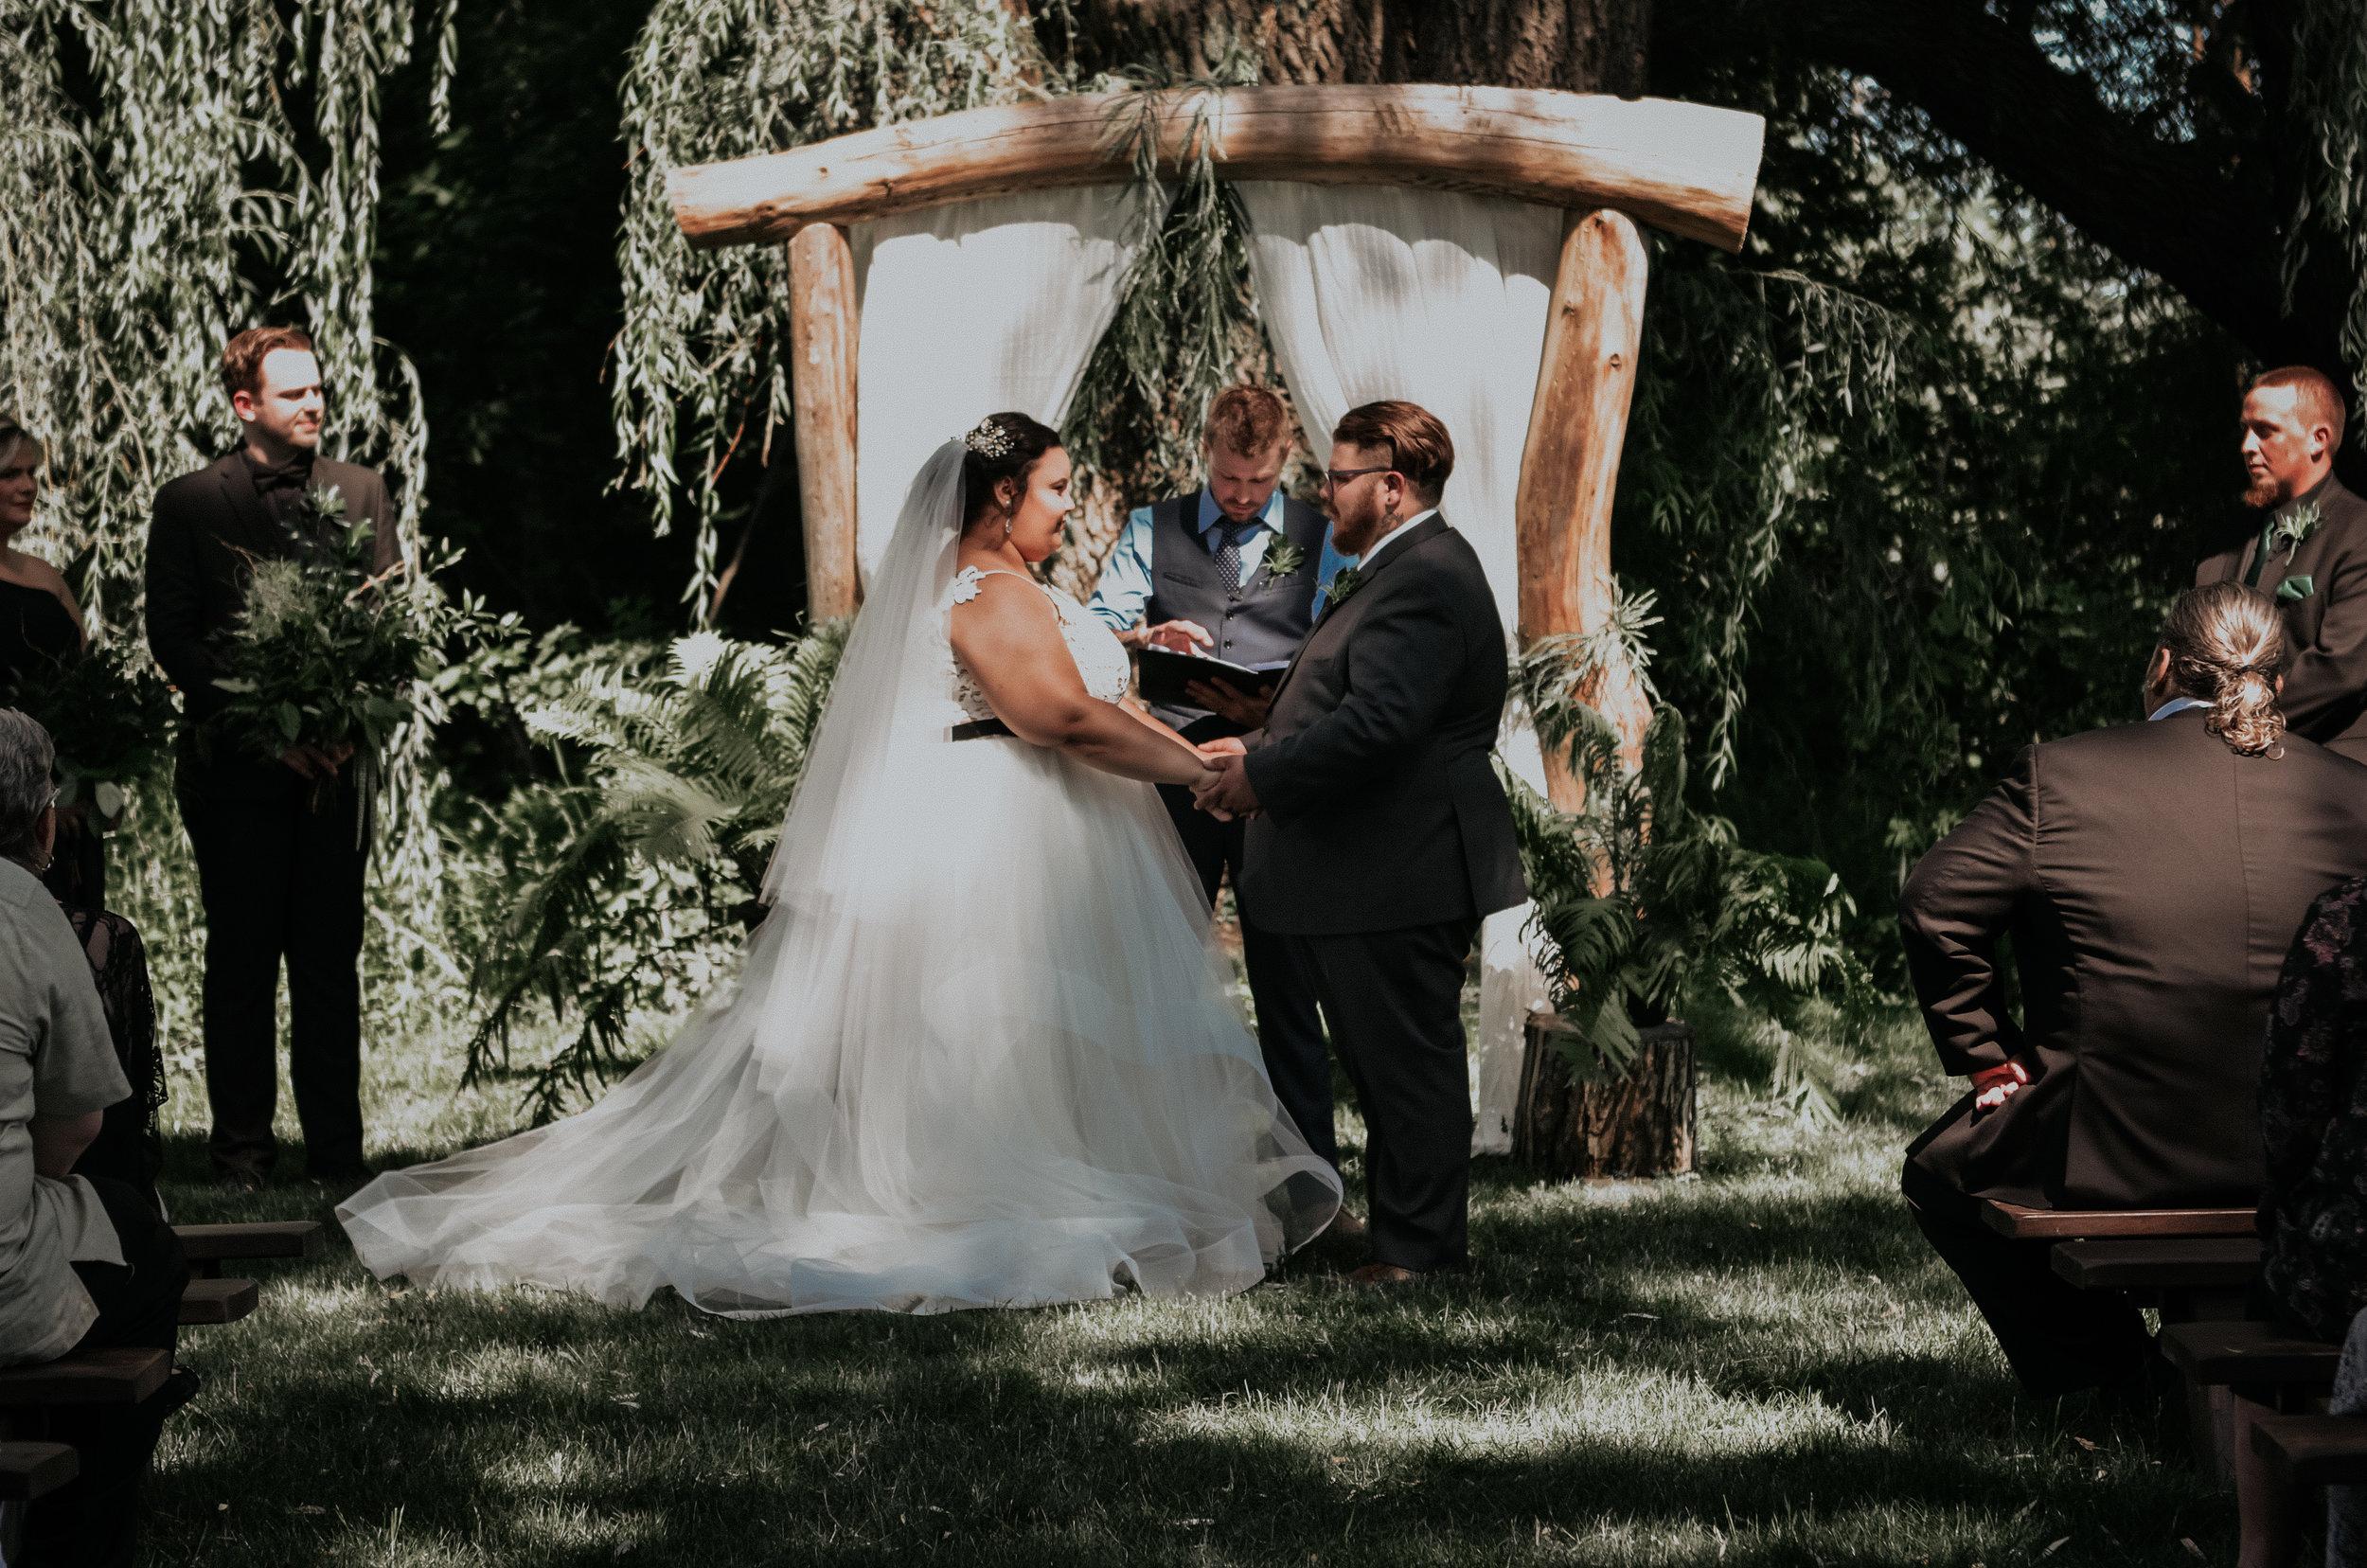 BridesbyYoung-RealWedding-PlusSizeBridal-BillyCourtney-JurassicParkTheme-26.jpg